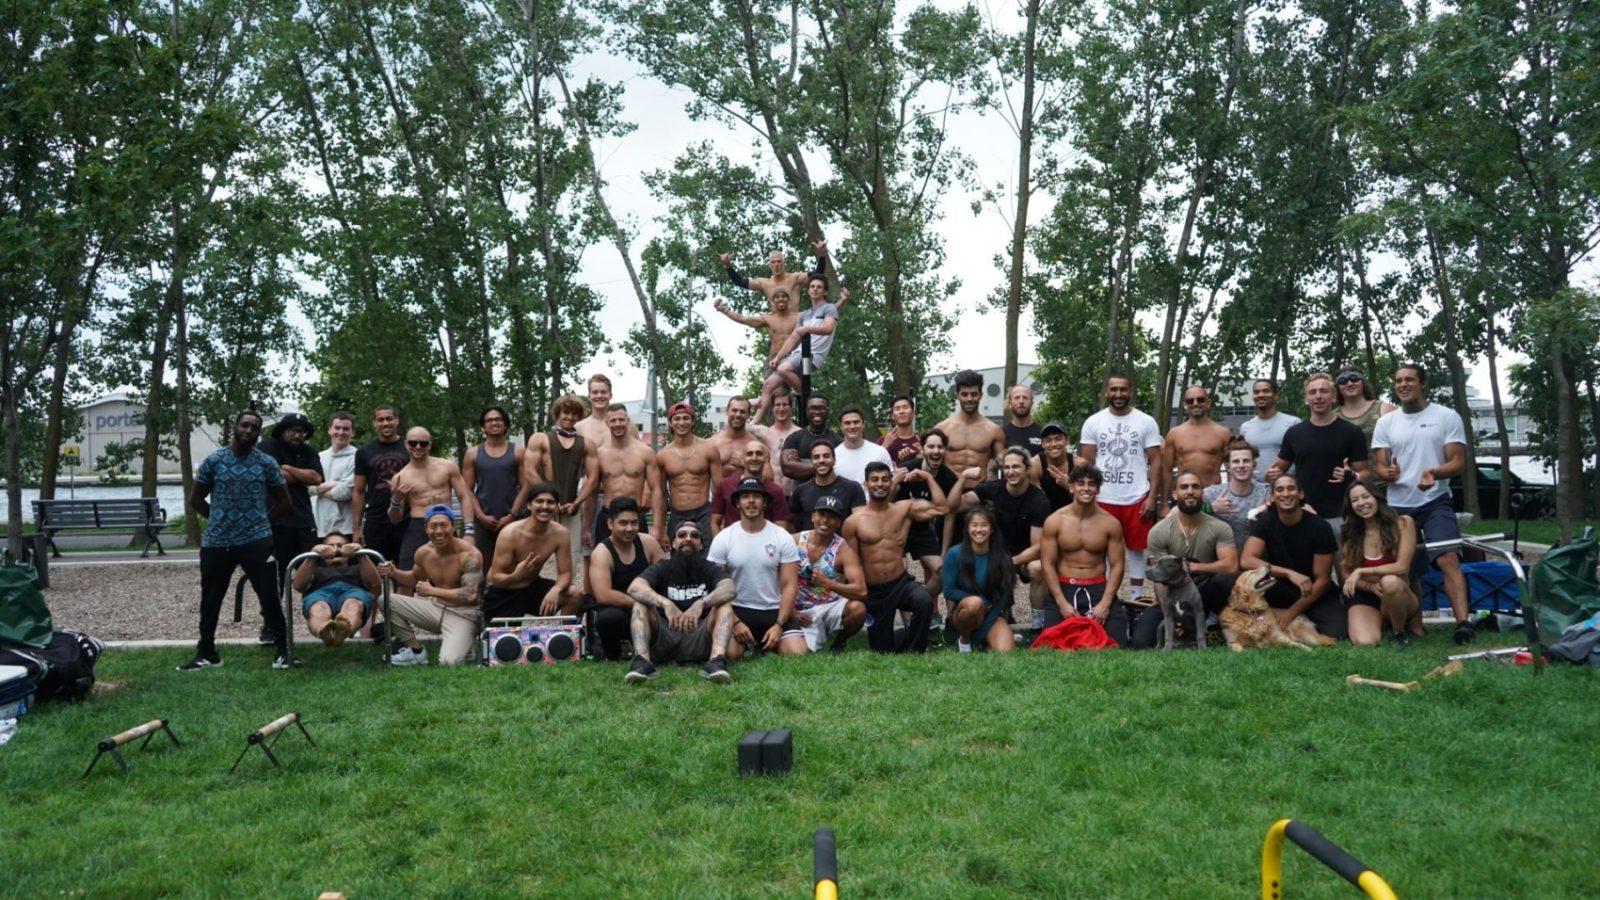 Toronto Calisthenics Meetup Pictures – Jul. 31st, 2021